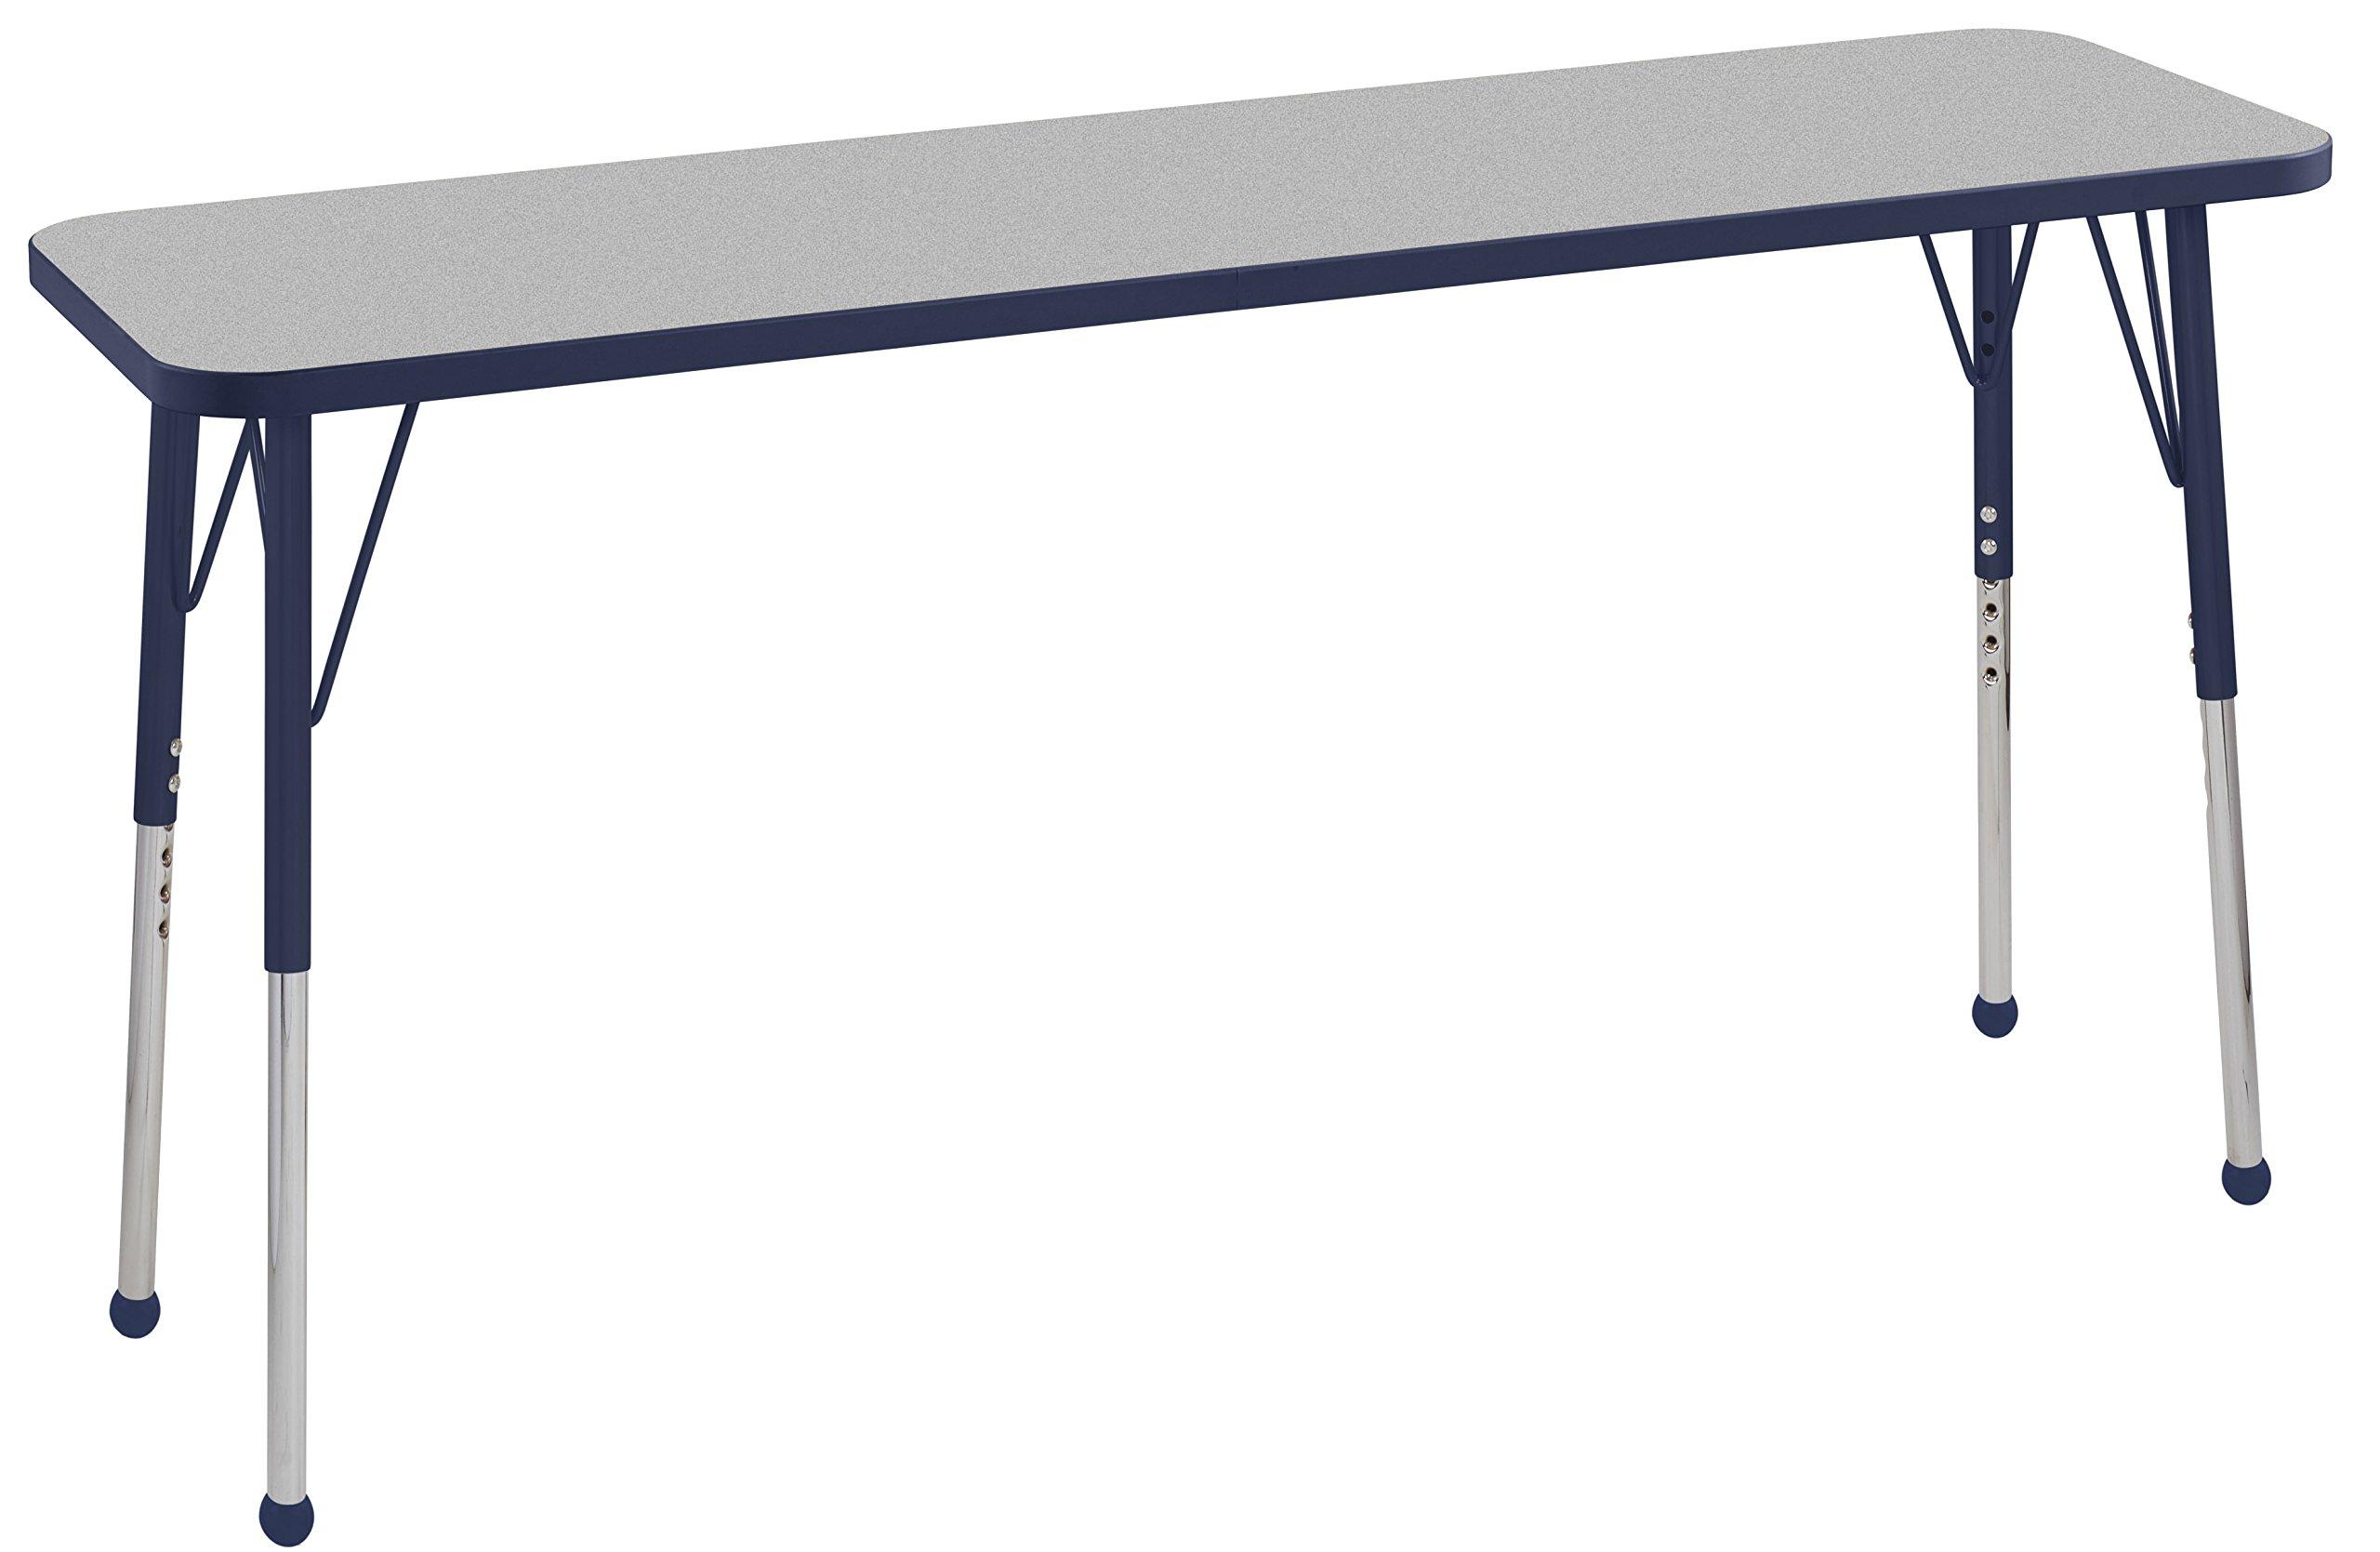 ECR4Kids Everyday T-Mold 18'' x 60'' Rectangular Activity School Table, Standard Legs w/Ball Glides, Adjustable Height 19-30 inch (Grey/Navy)